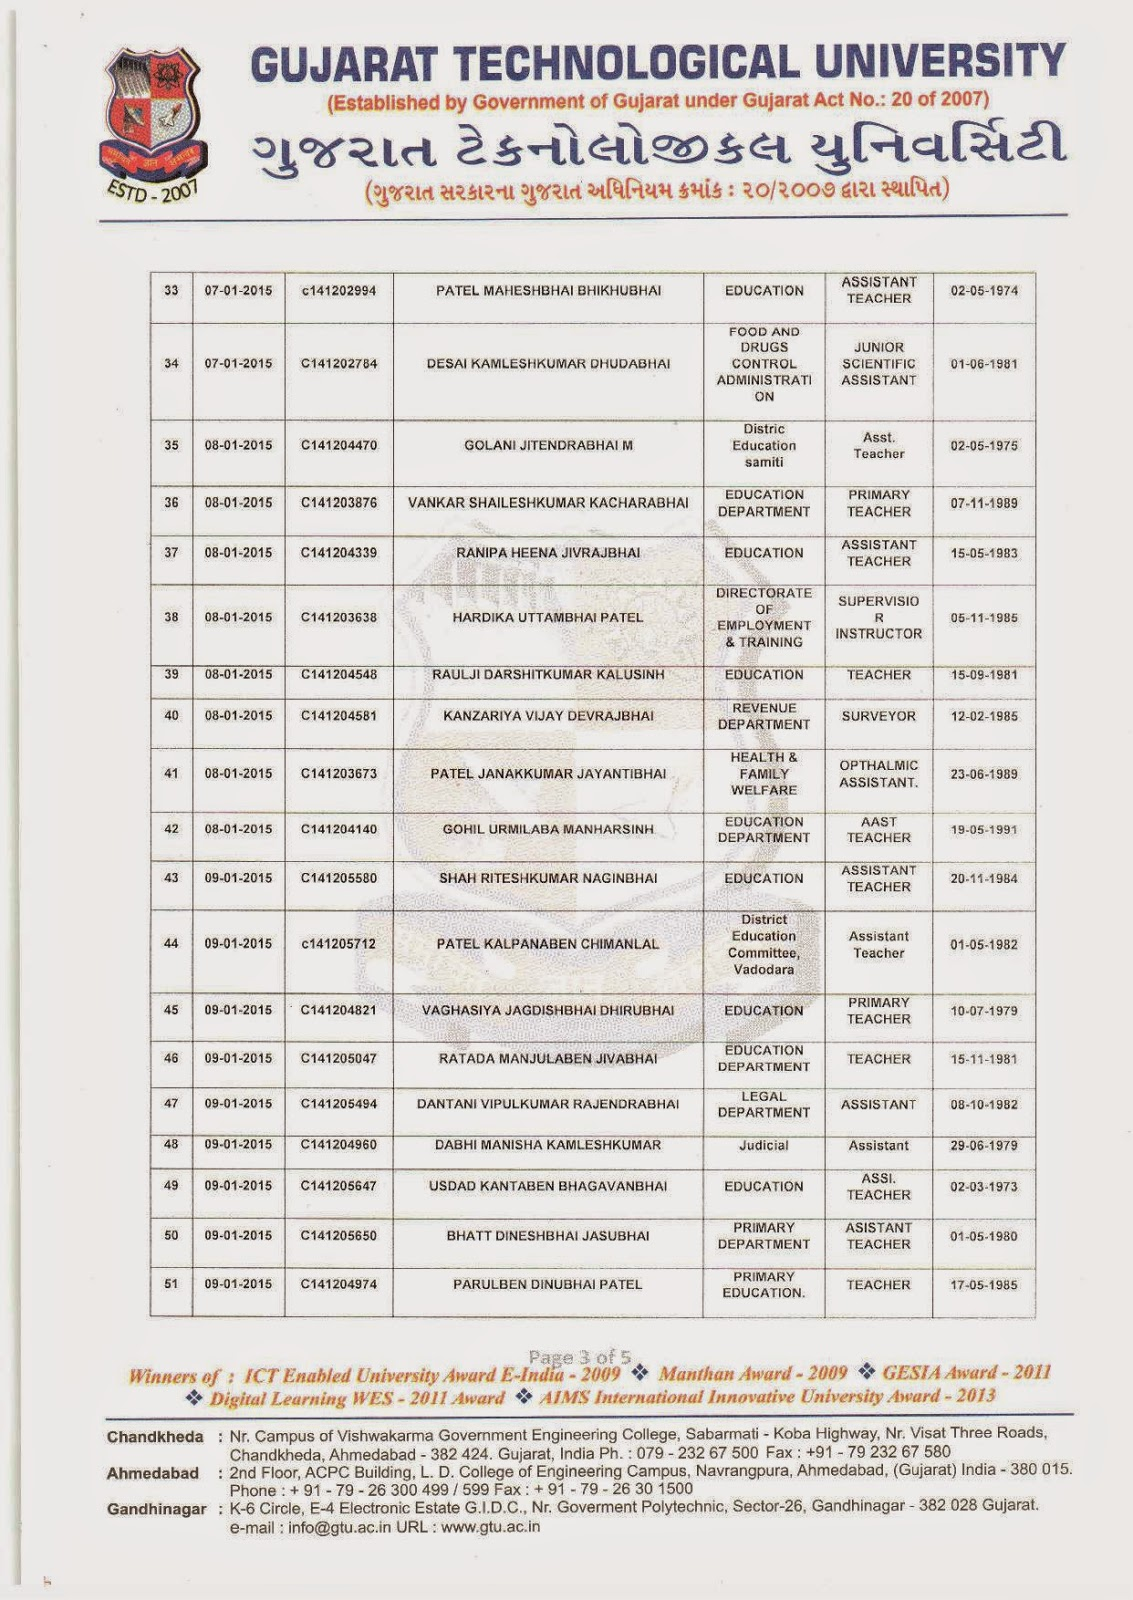 Ccc Gtu Sudhipatra 2014 15 Name Sudhara Mihirkumar